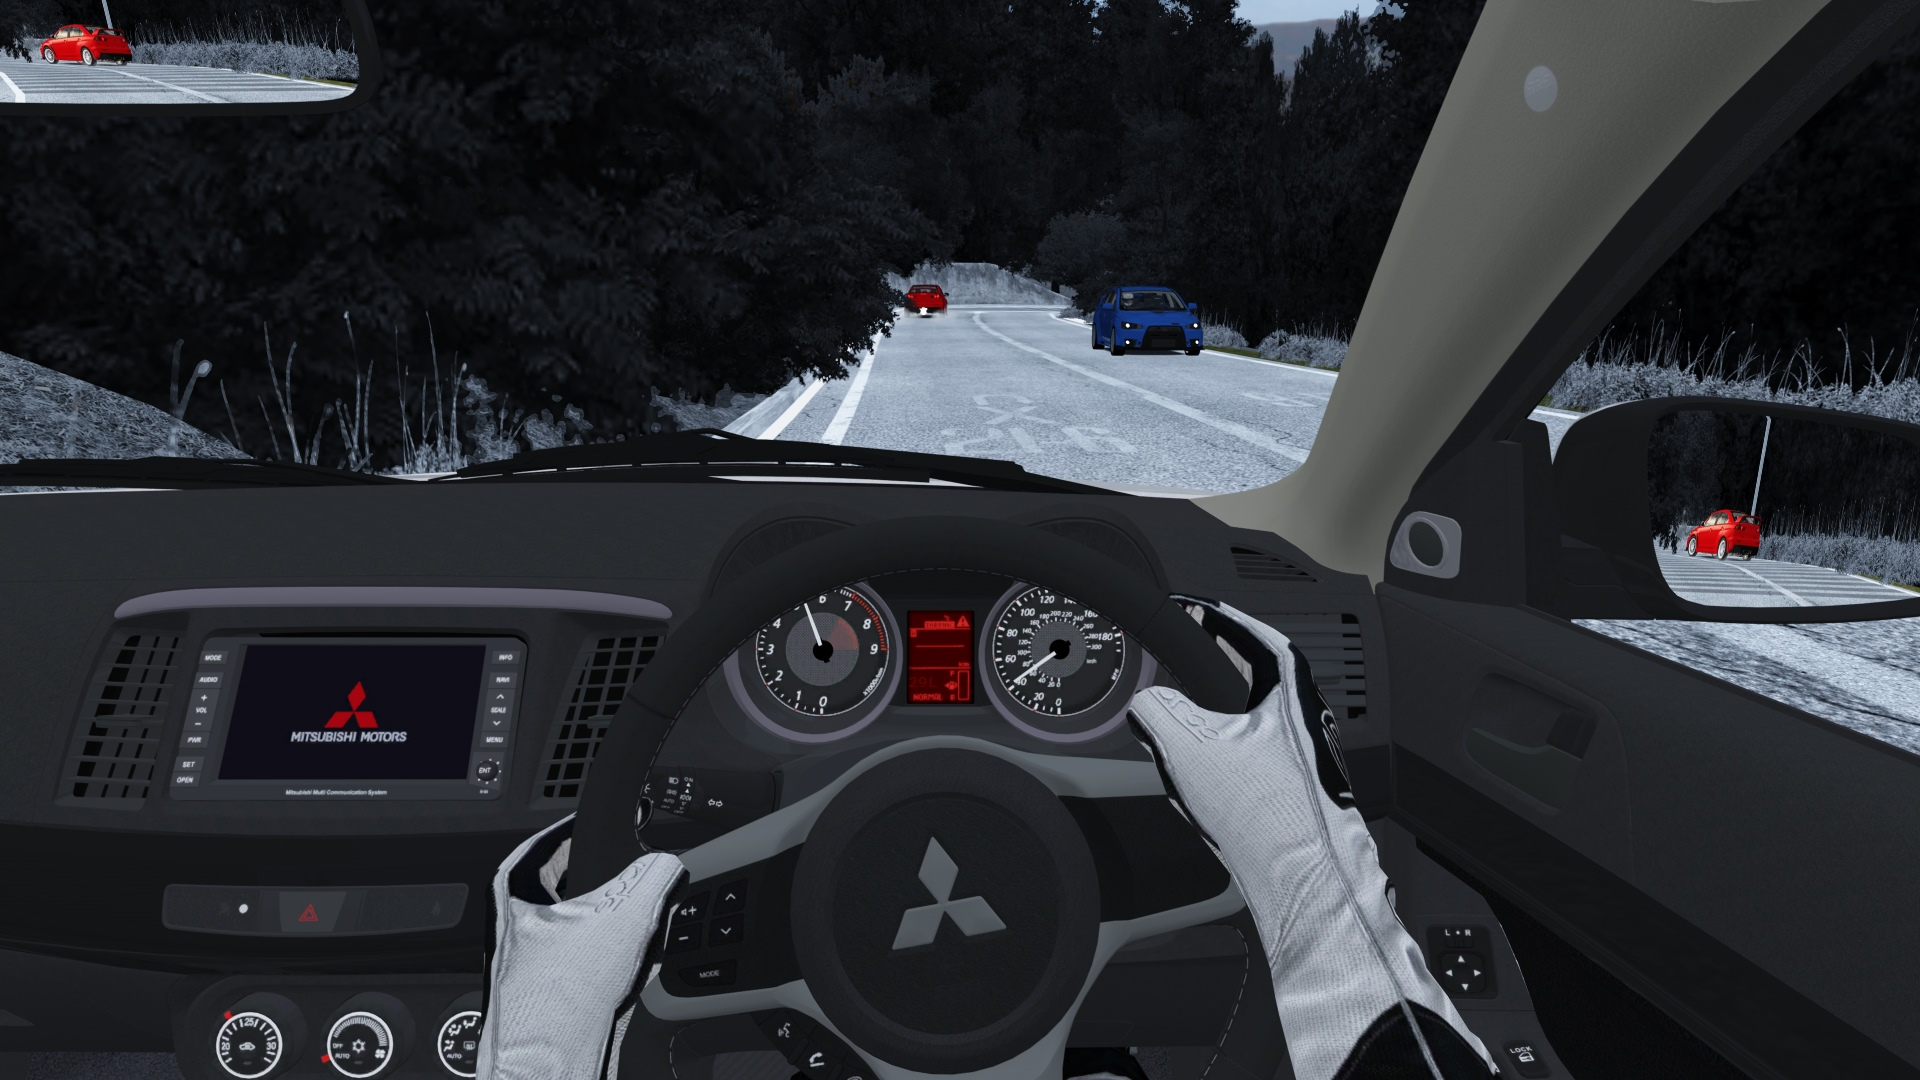 Screenshot_mitsubishi_lancer_evox_fq400_akagi mountain pass_16-1-120-15-36-22.jpg